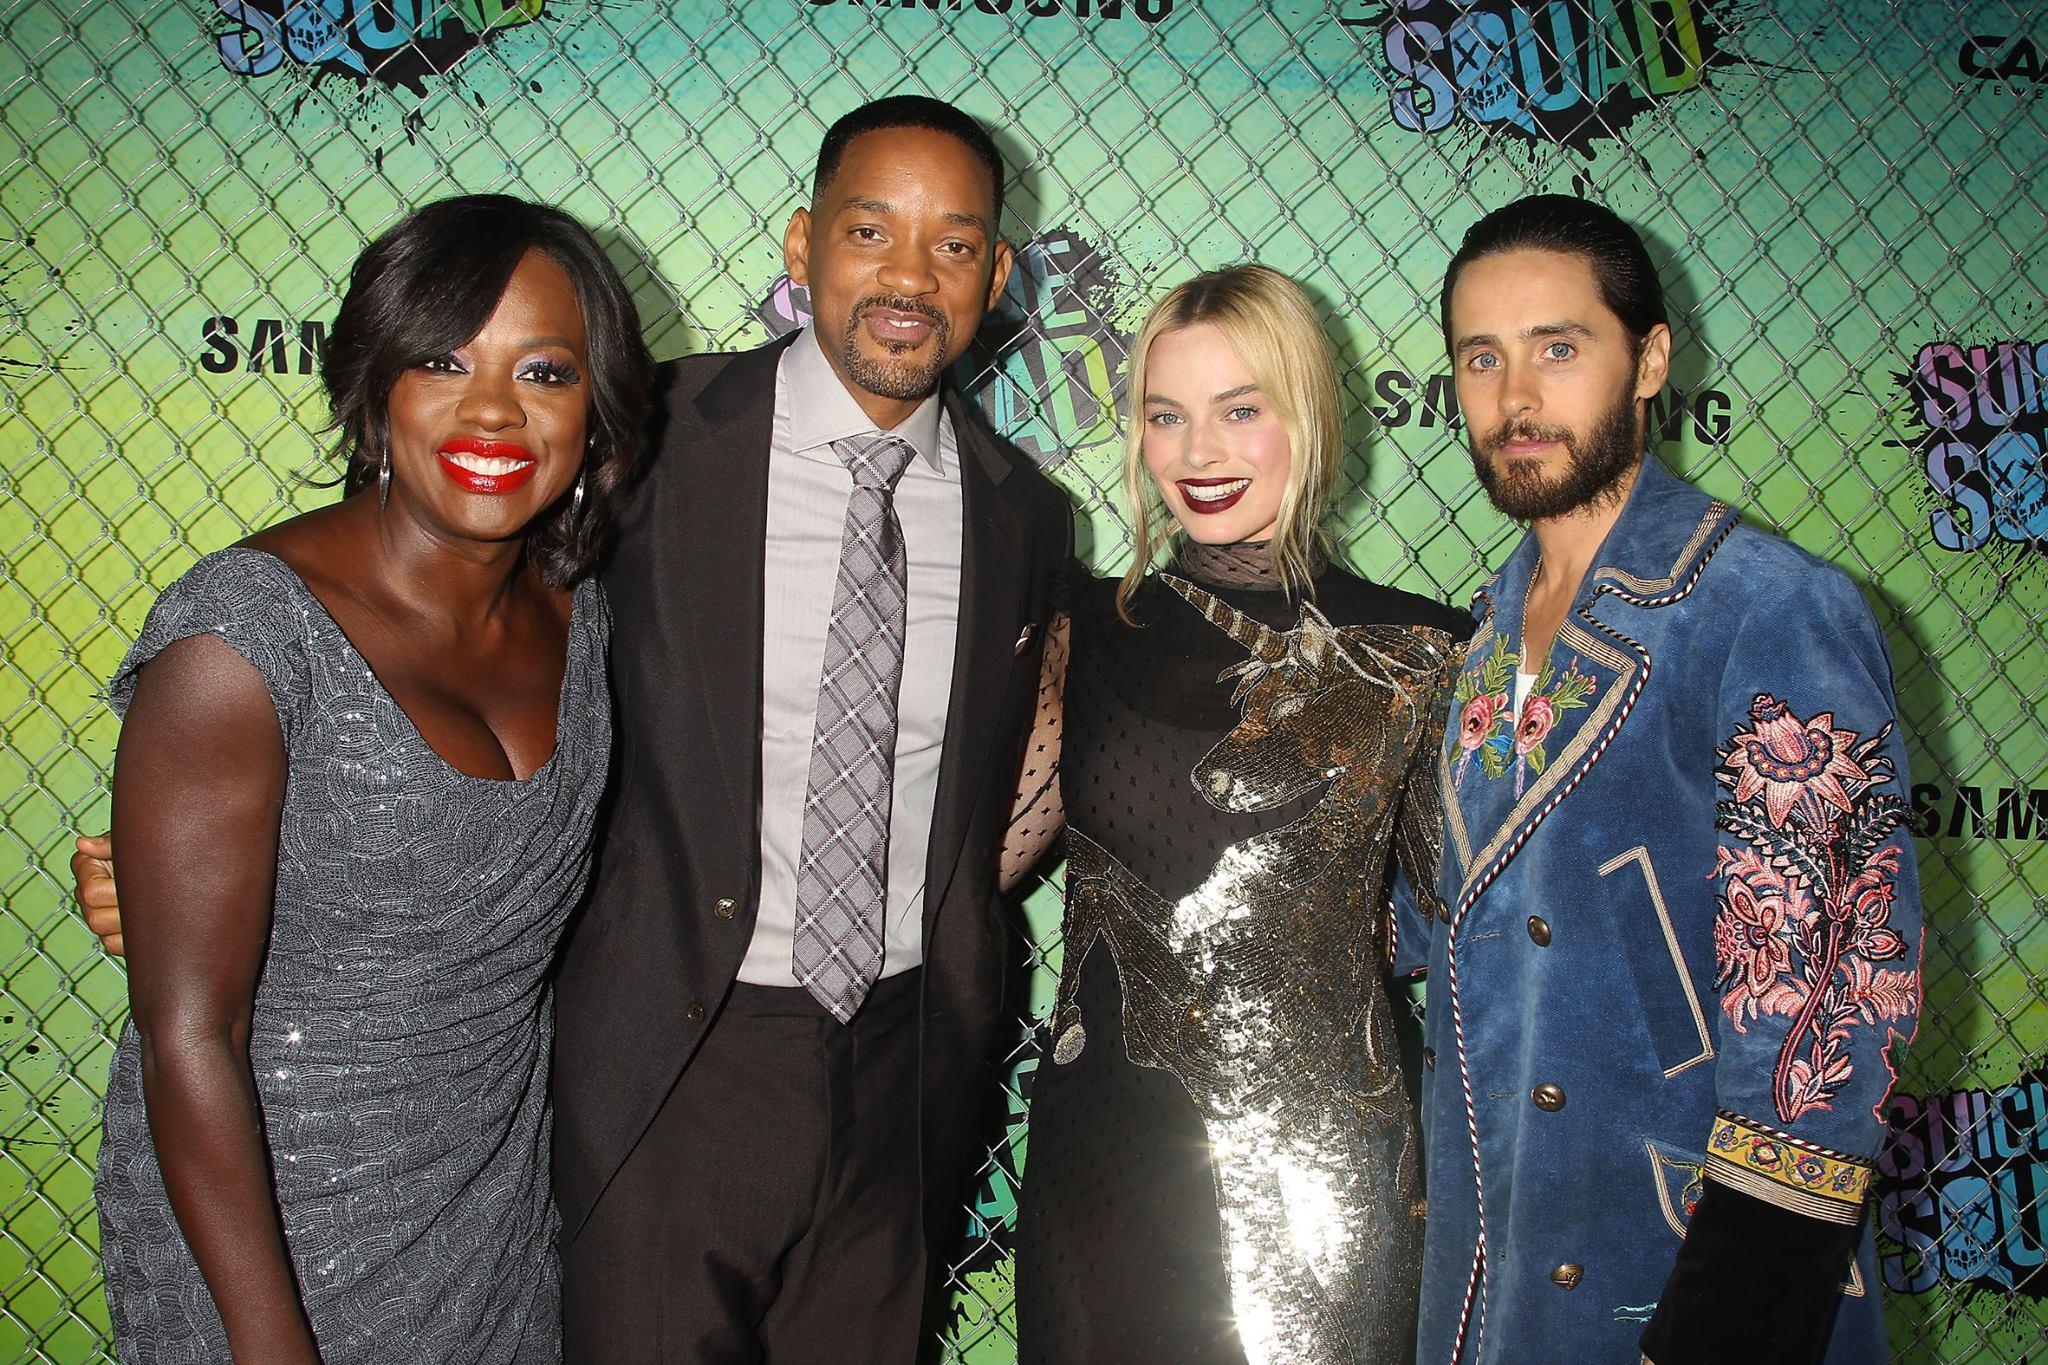 Will & Jaden Smith, Viola Davis & More Attend 'Suicide Squad' NYC Premiere